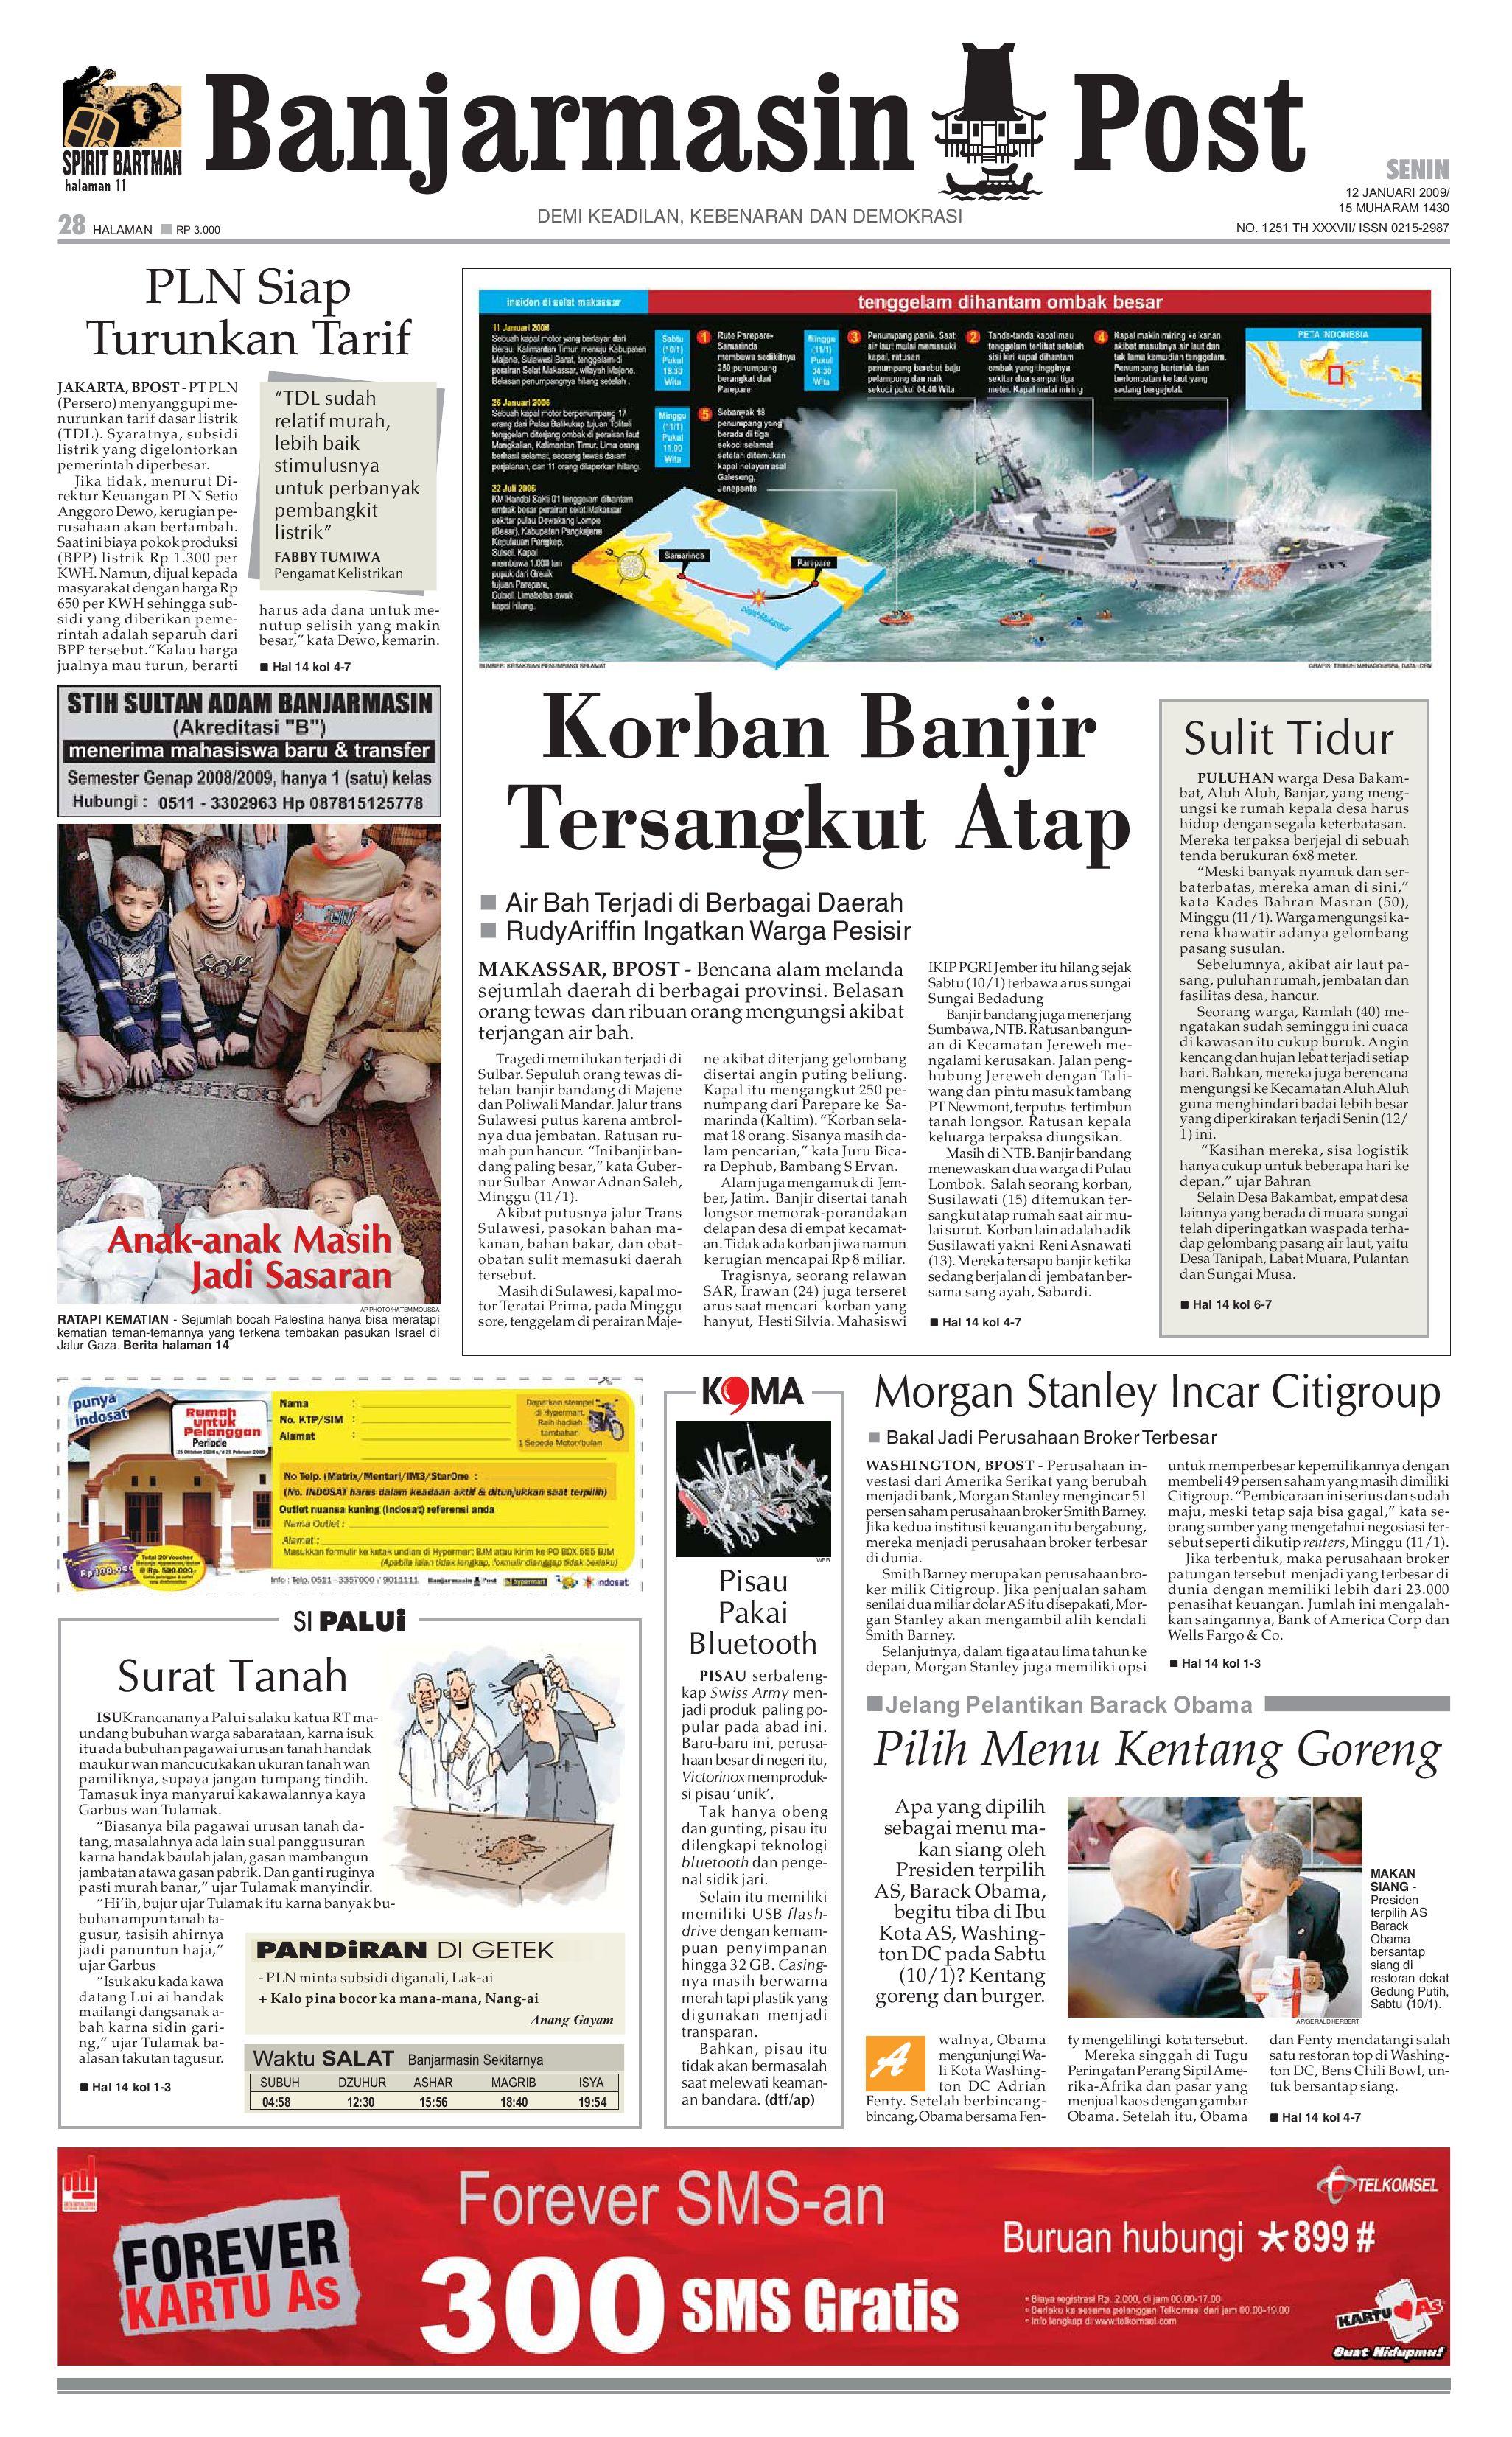 Banjarmasin Post 12 Januari 2009 By Issuu Nature Pecinta Voucher Hypermart 50000 Alam